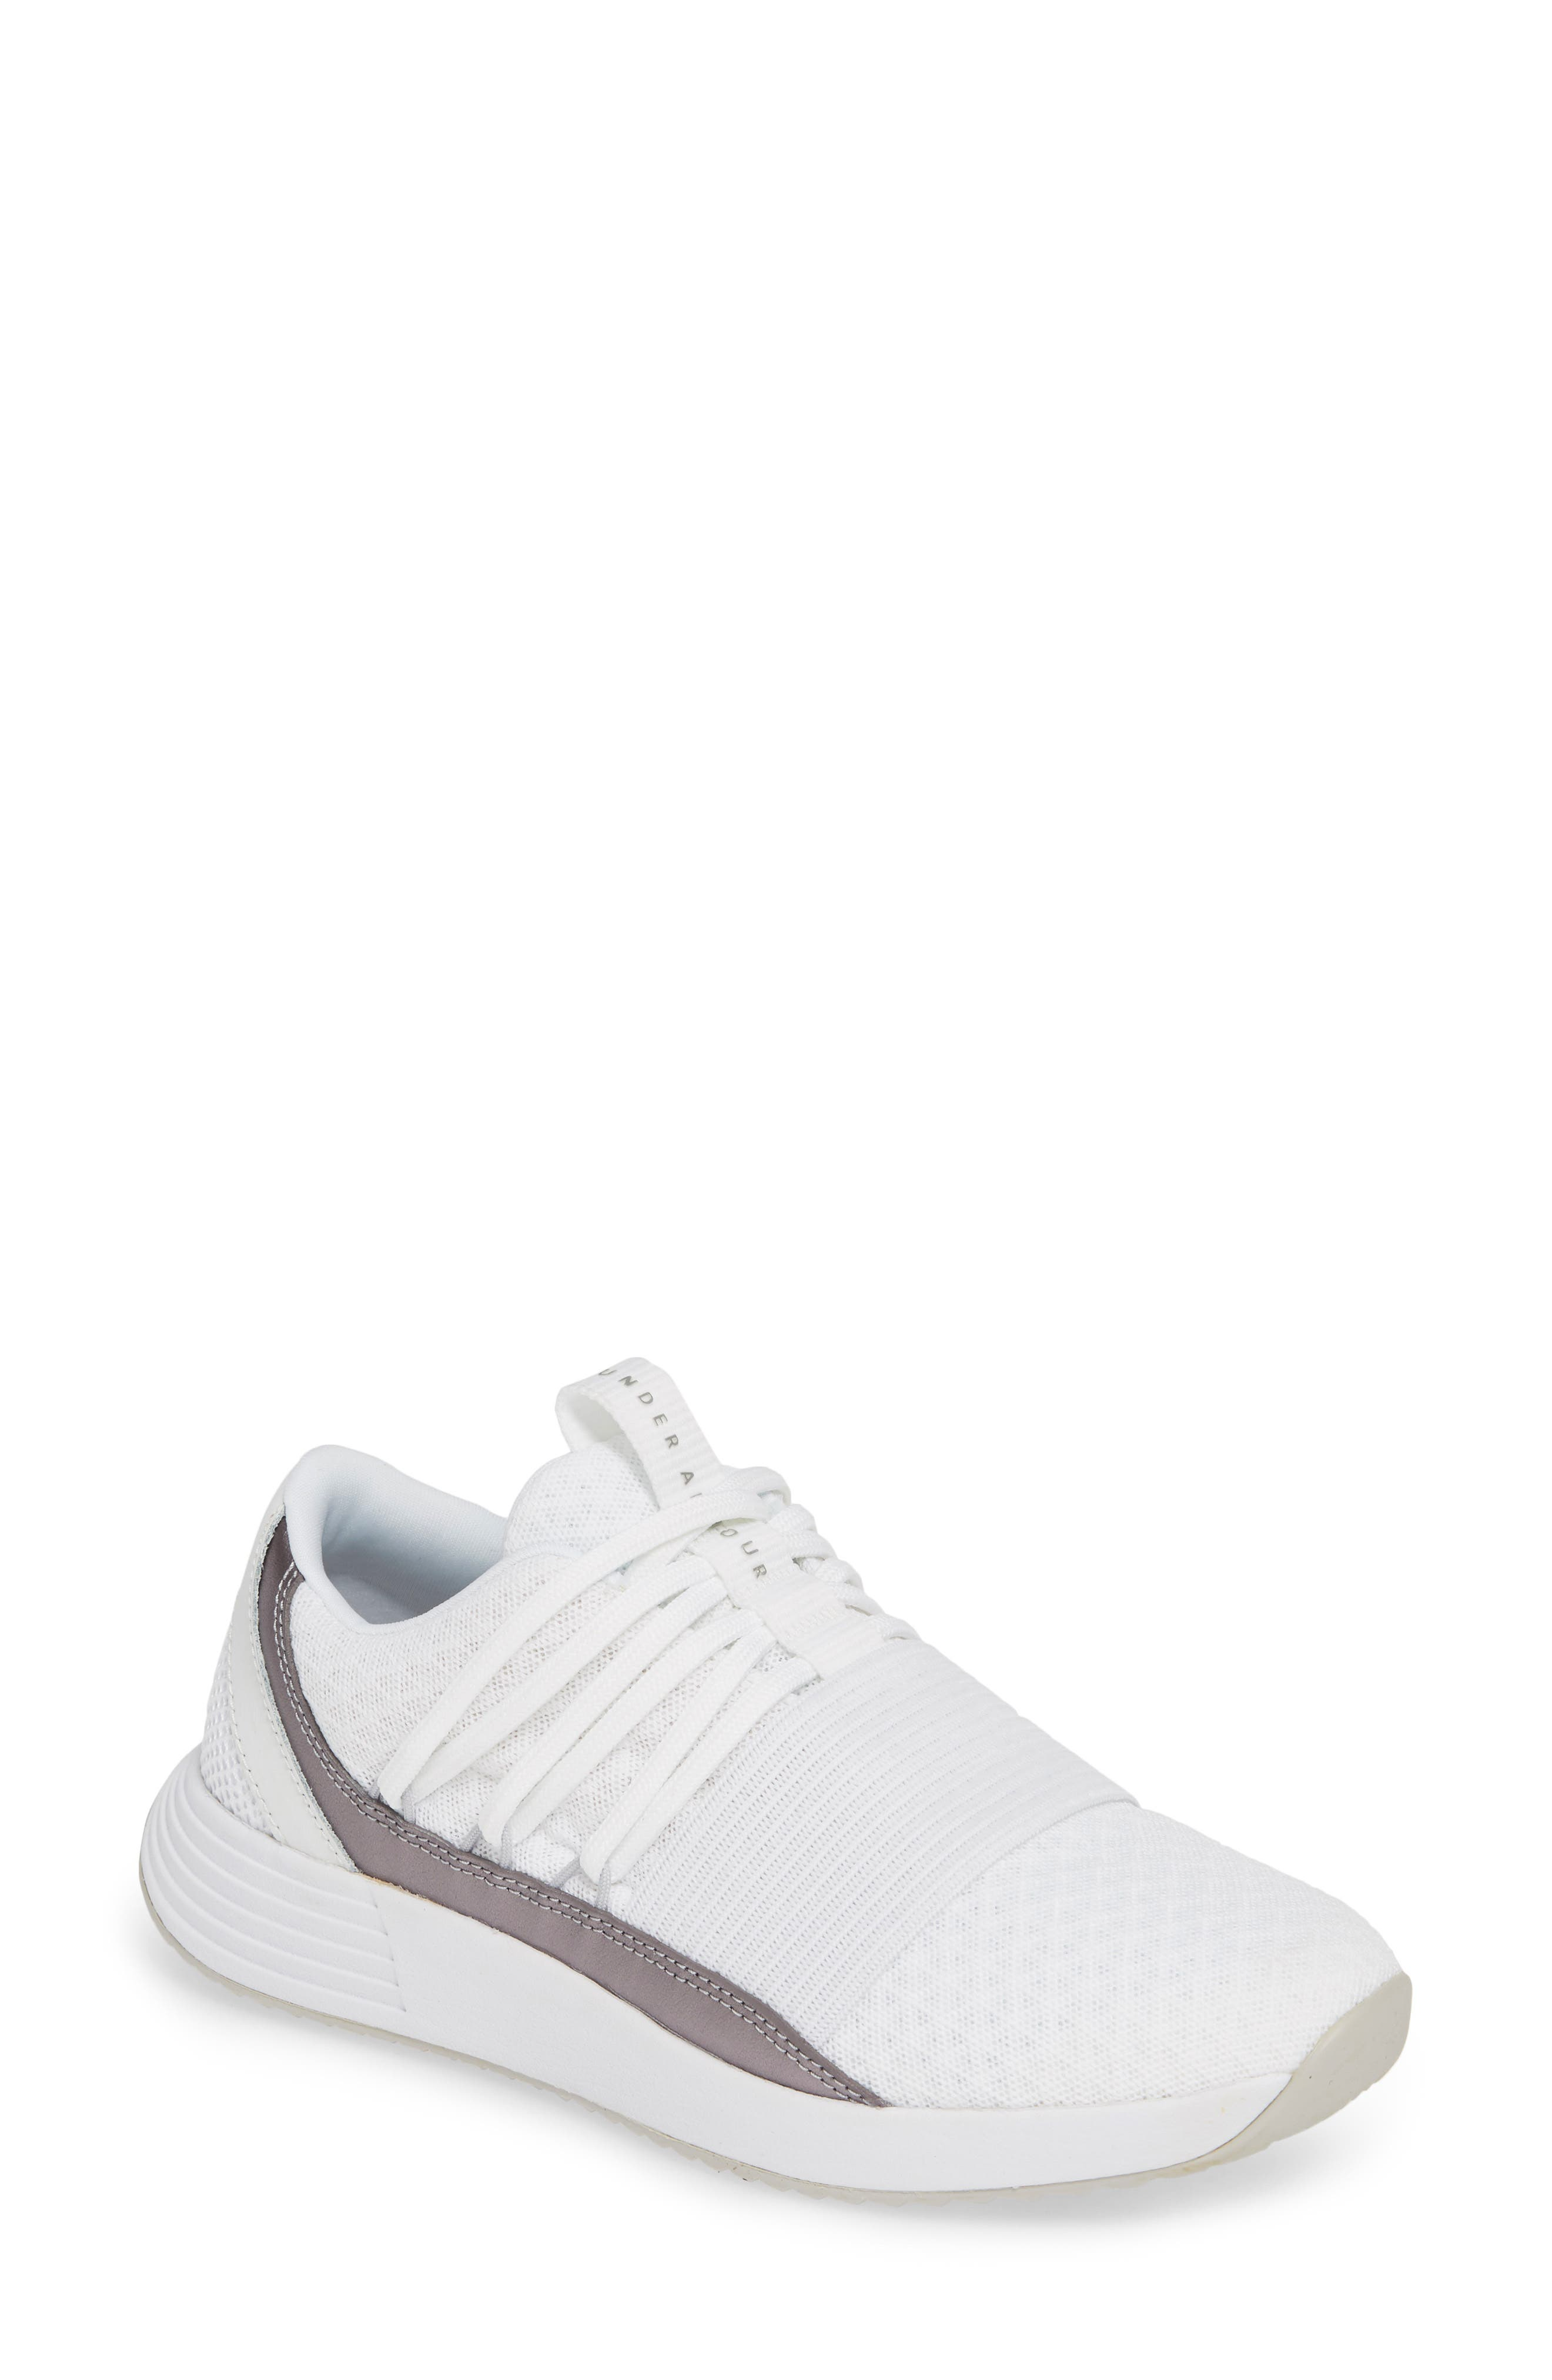 UNDER ARMOUR,                             Breathe Lace X NM Sneaker,                             Main thumbnail 1, color,                             WHITE/ WHITE/ METALLIC BLUSH